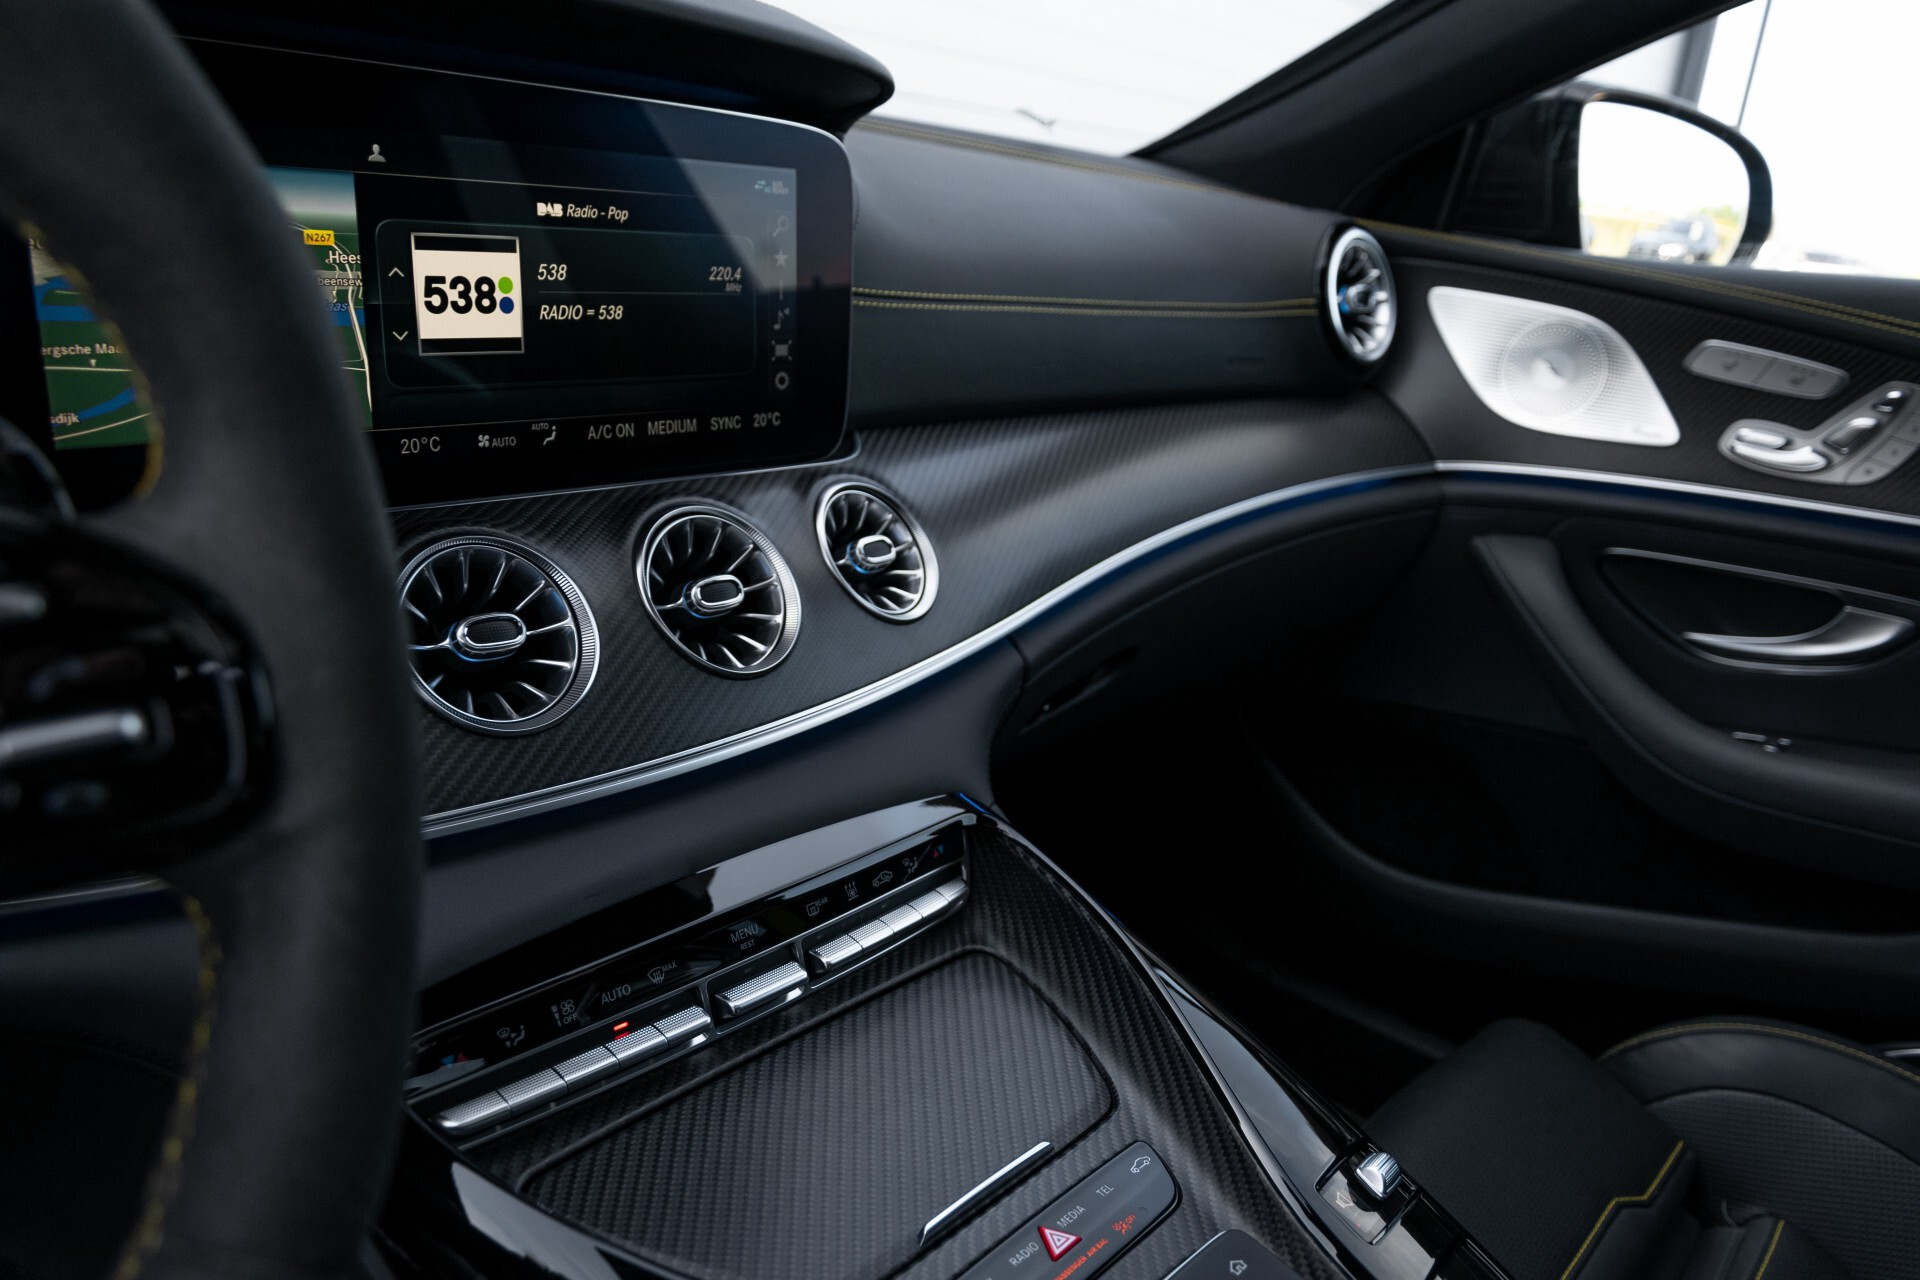 Mercedes-Benz AMG GT 4-Door Coupe 63 S 4MATIC+ Edition 1 Keramisch/Carbon/First Class/Dynamic Plus/Burmester High End 3D Aut9 Foto 48